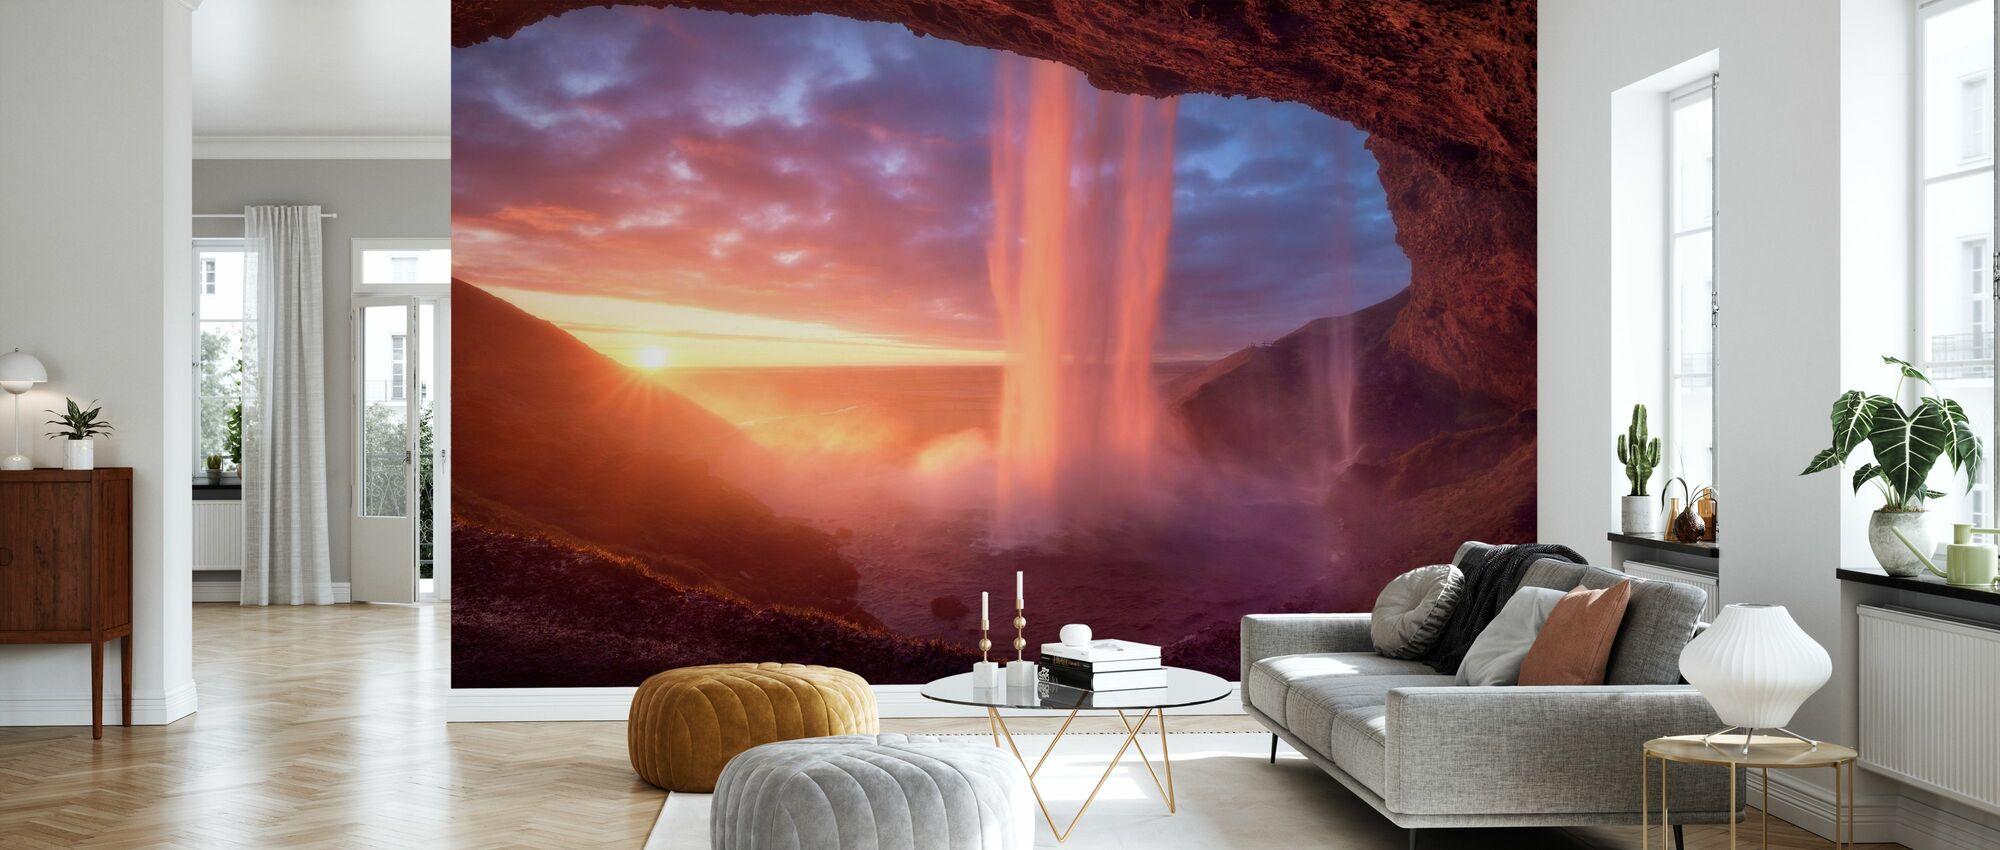 Wall of Flames - Wallpaper - Living Room